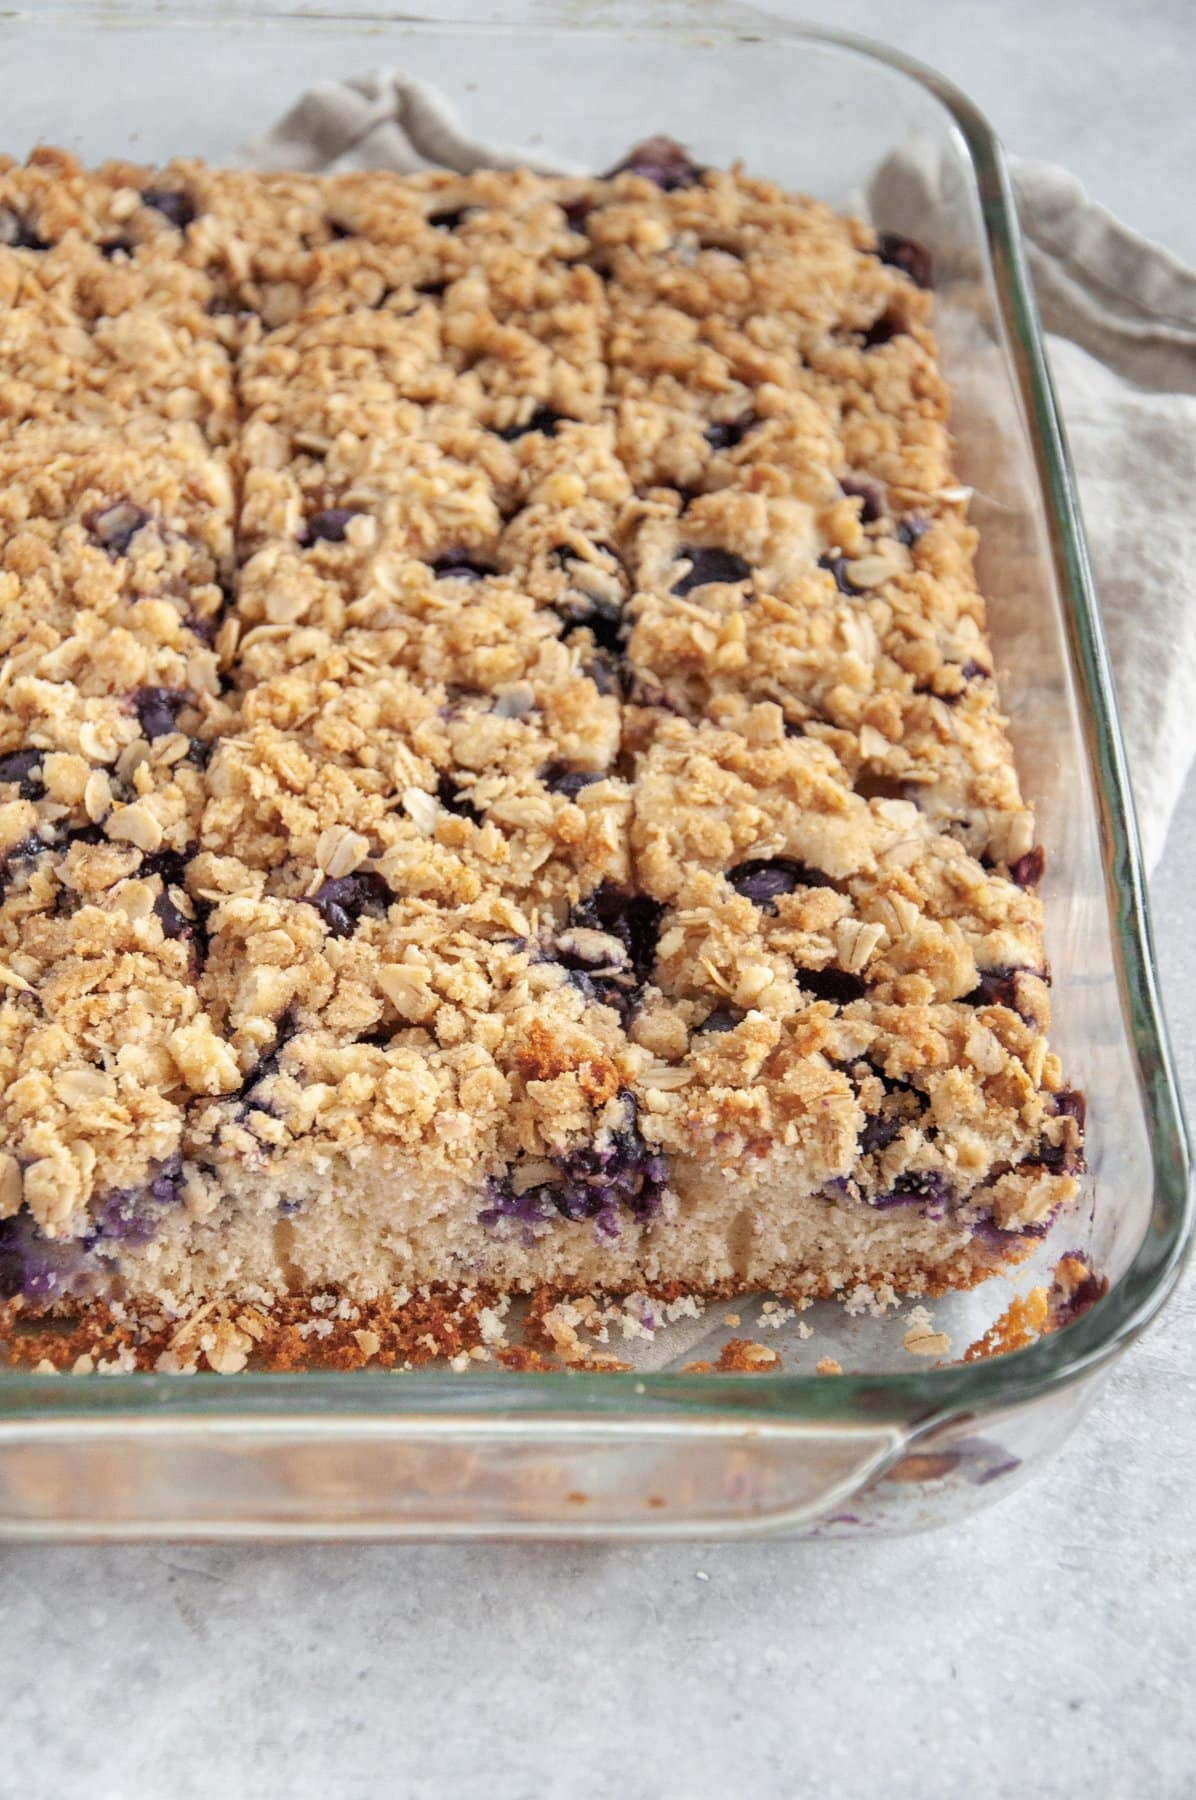 pan of lemon blueberry coffee cake